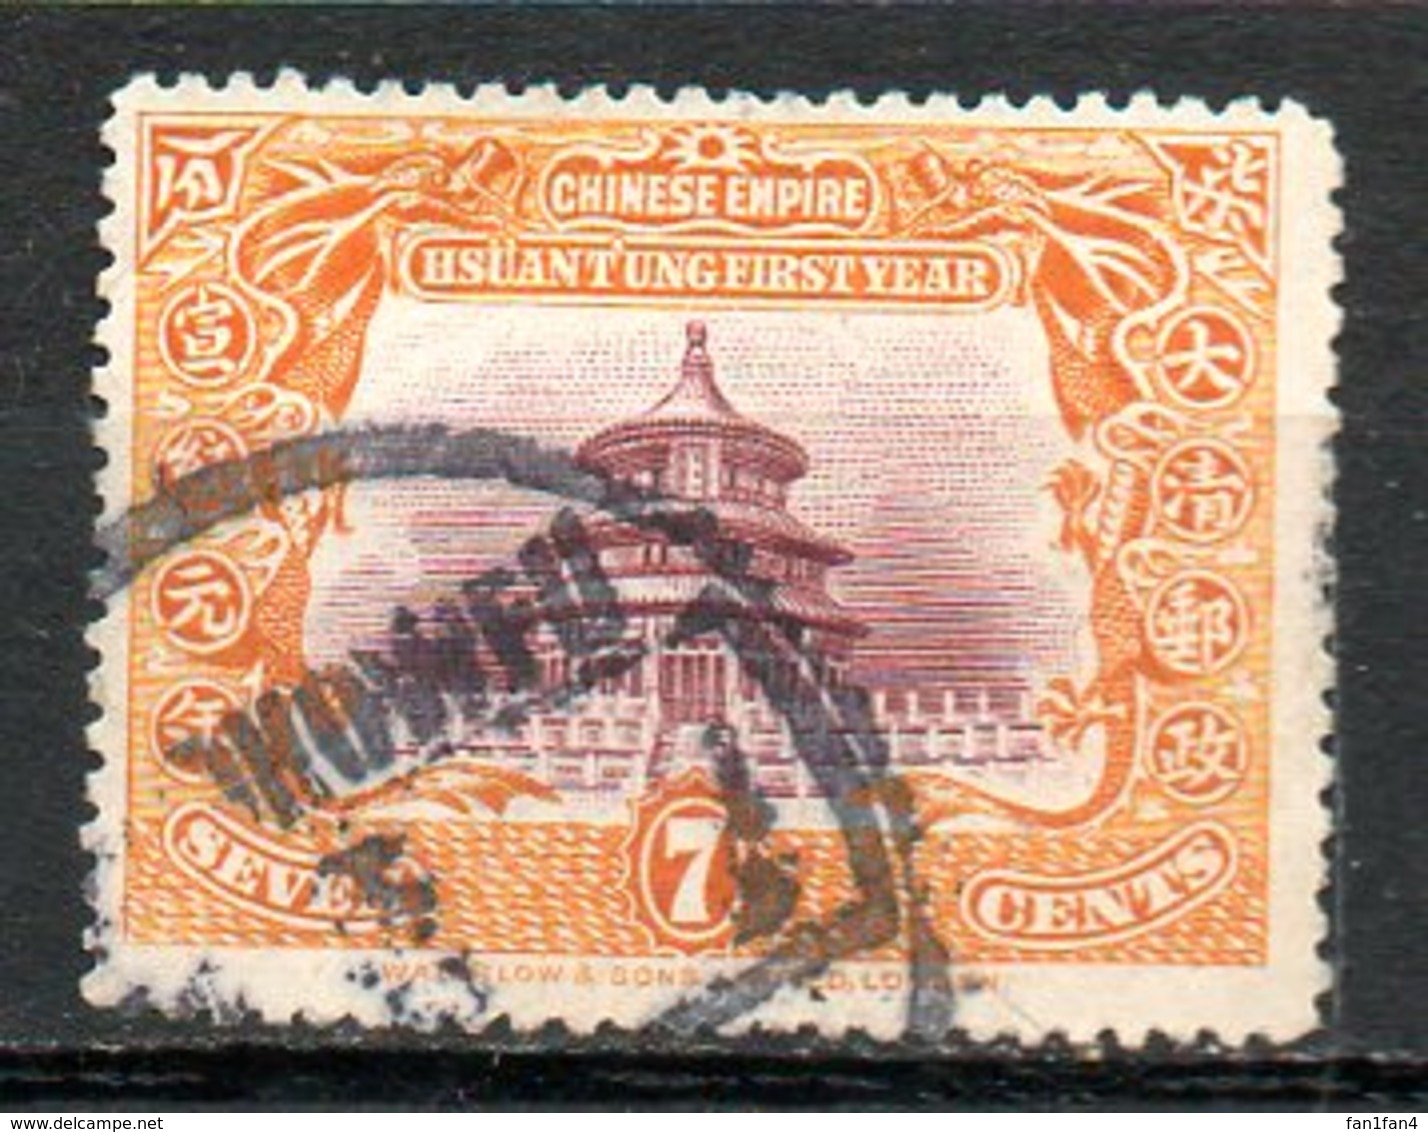 ASIE - (CHINE - EMPIRE) - 1909 - N° 82 - 7 C. Orange Et Brun-lilas - (Anniversaire Du Règne De Hsuan Tung) - China